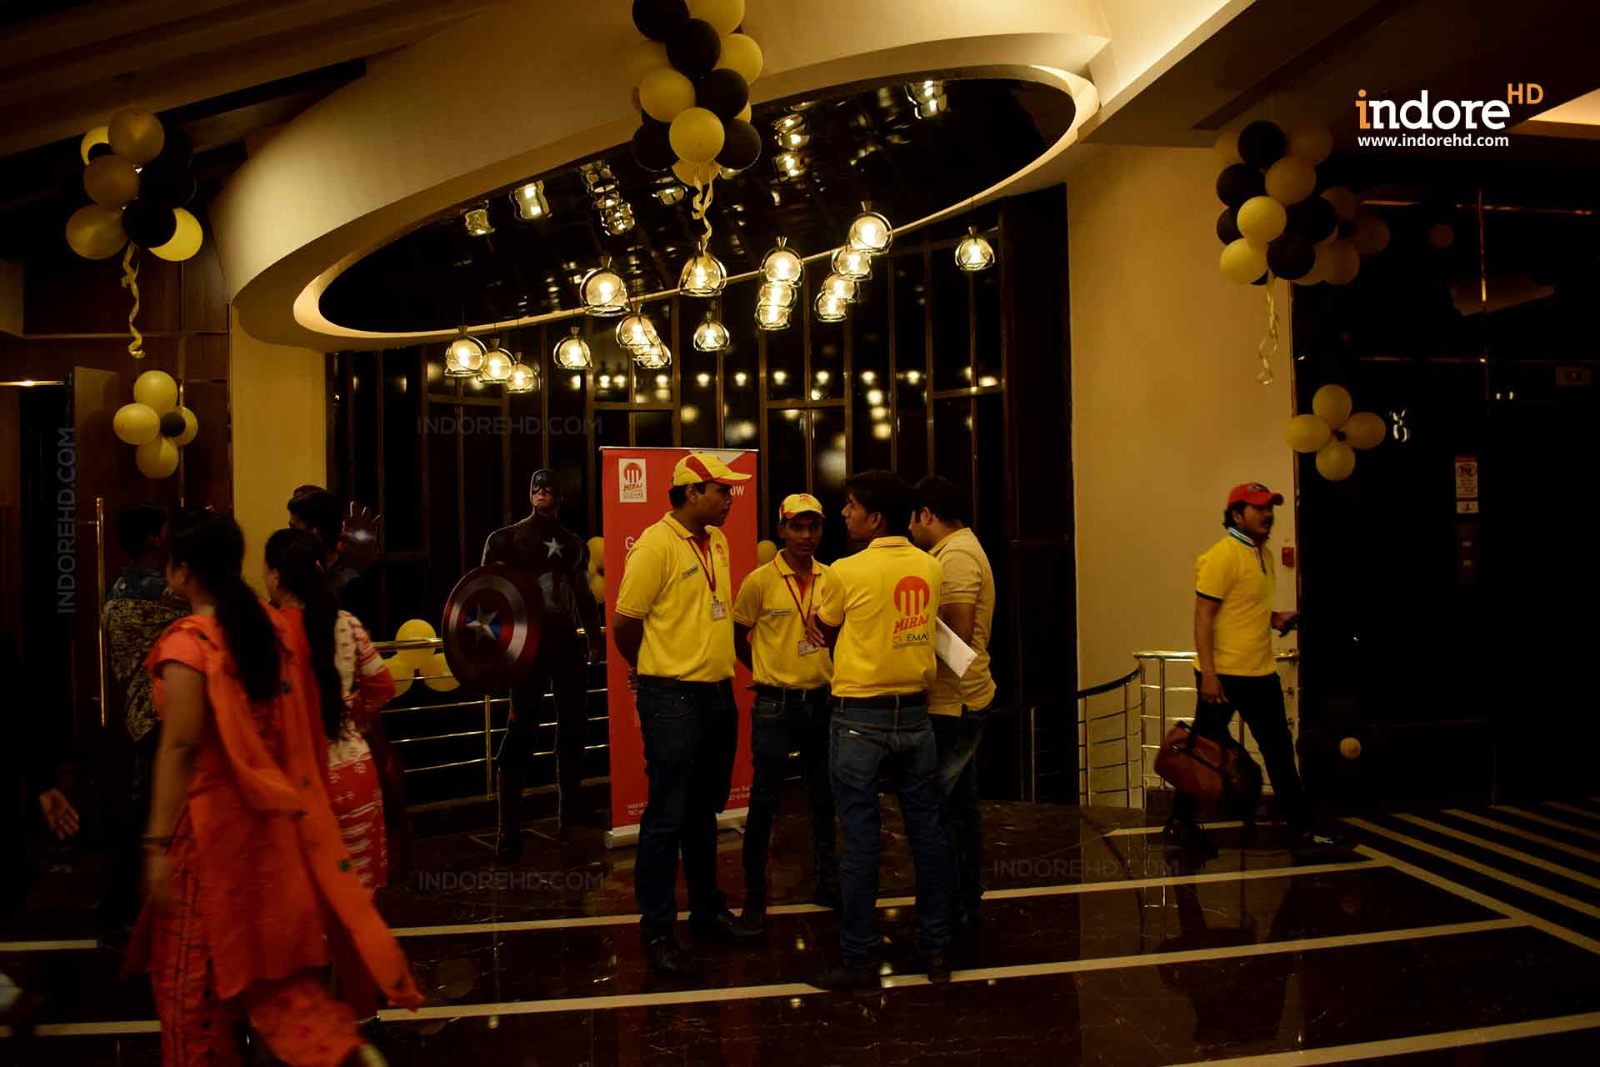 Indore-Miraj-Cinema-Indore-Hd-Indore-City-india